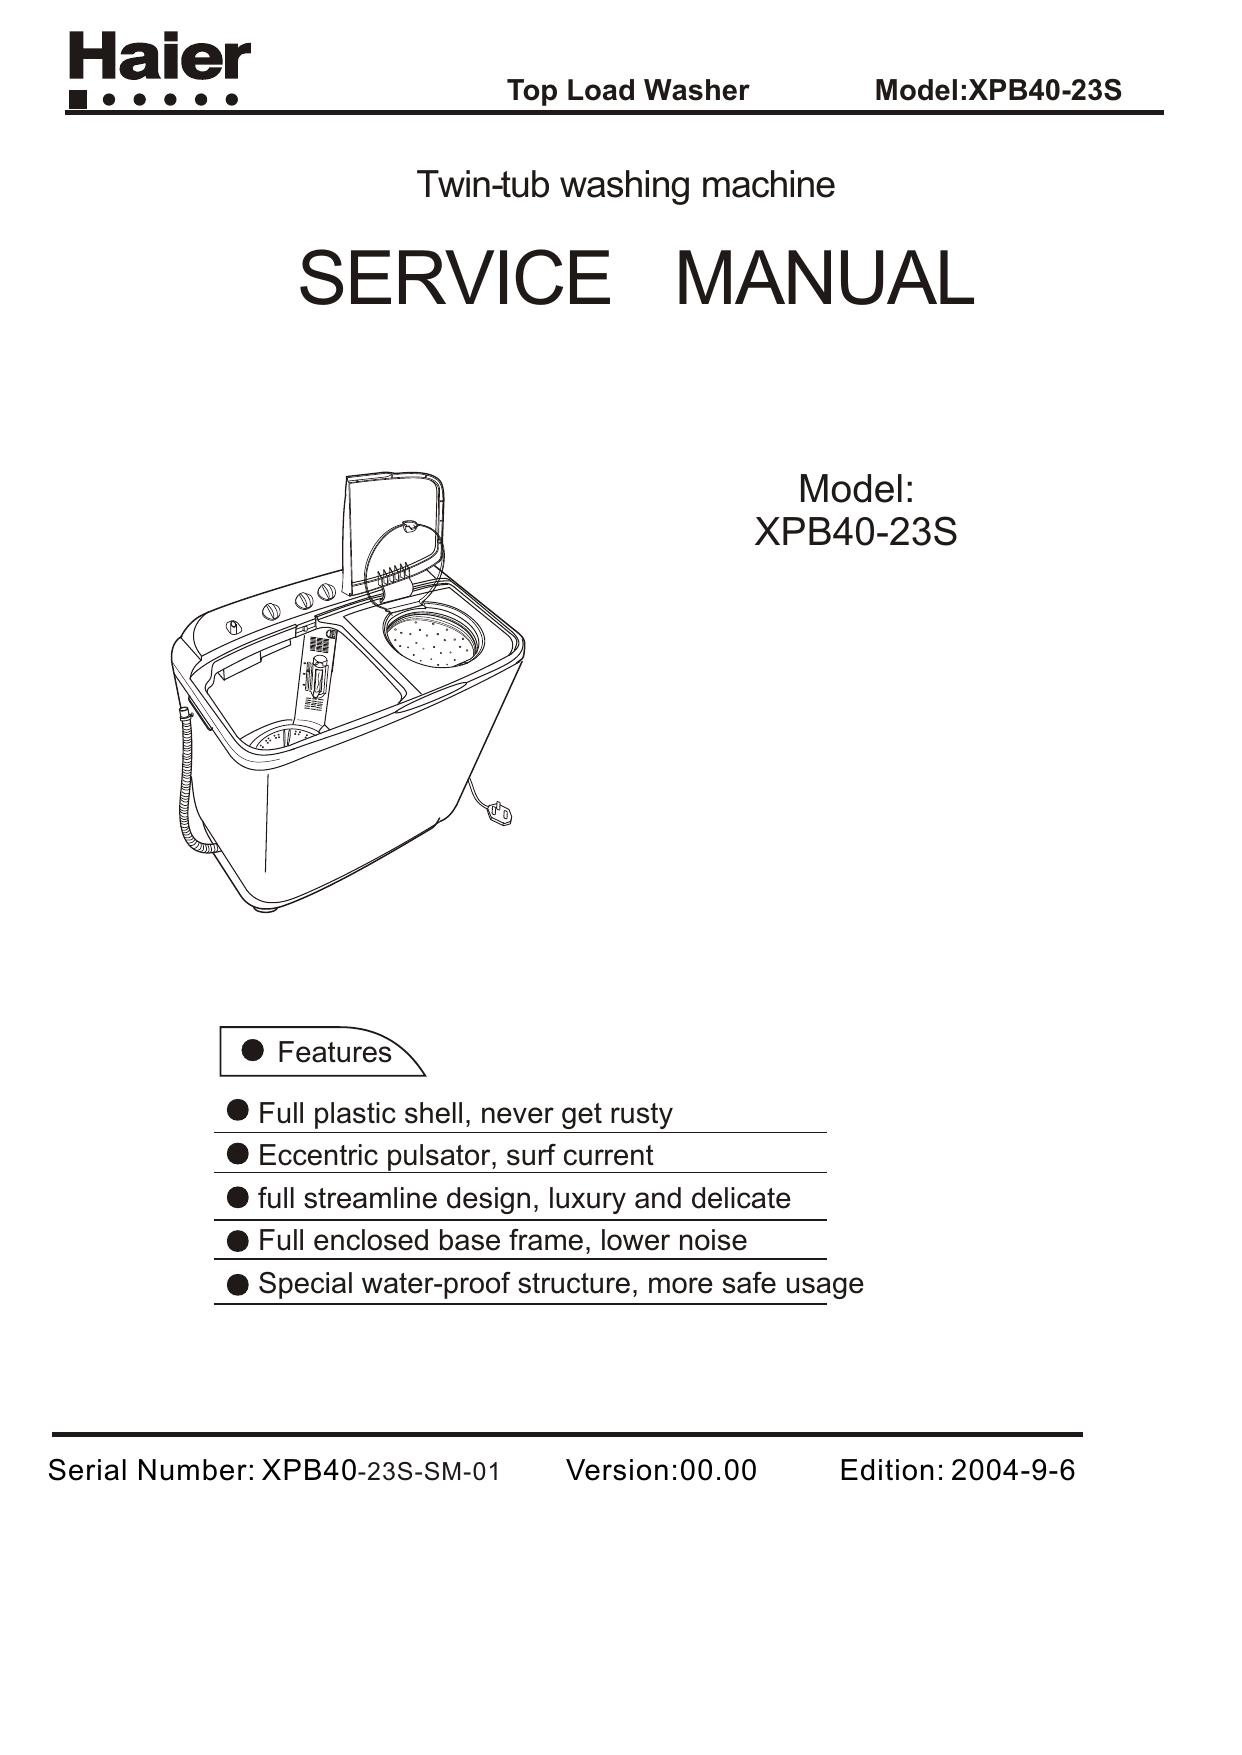 SERVICE MANUAL | manualzz.com on